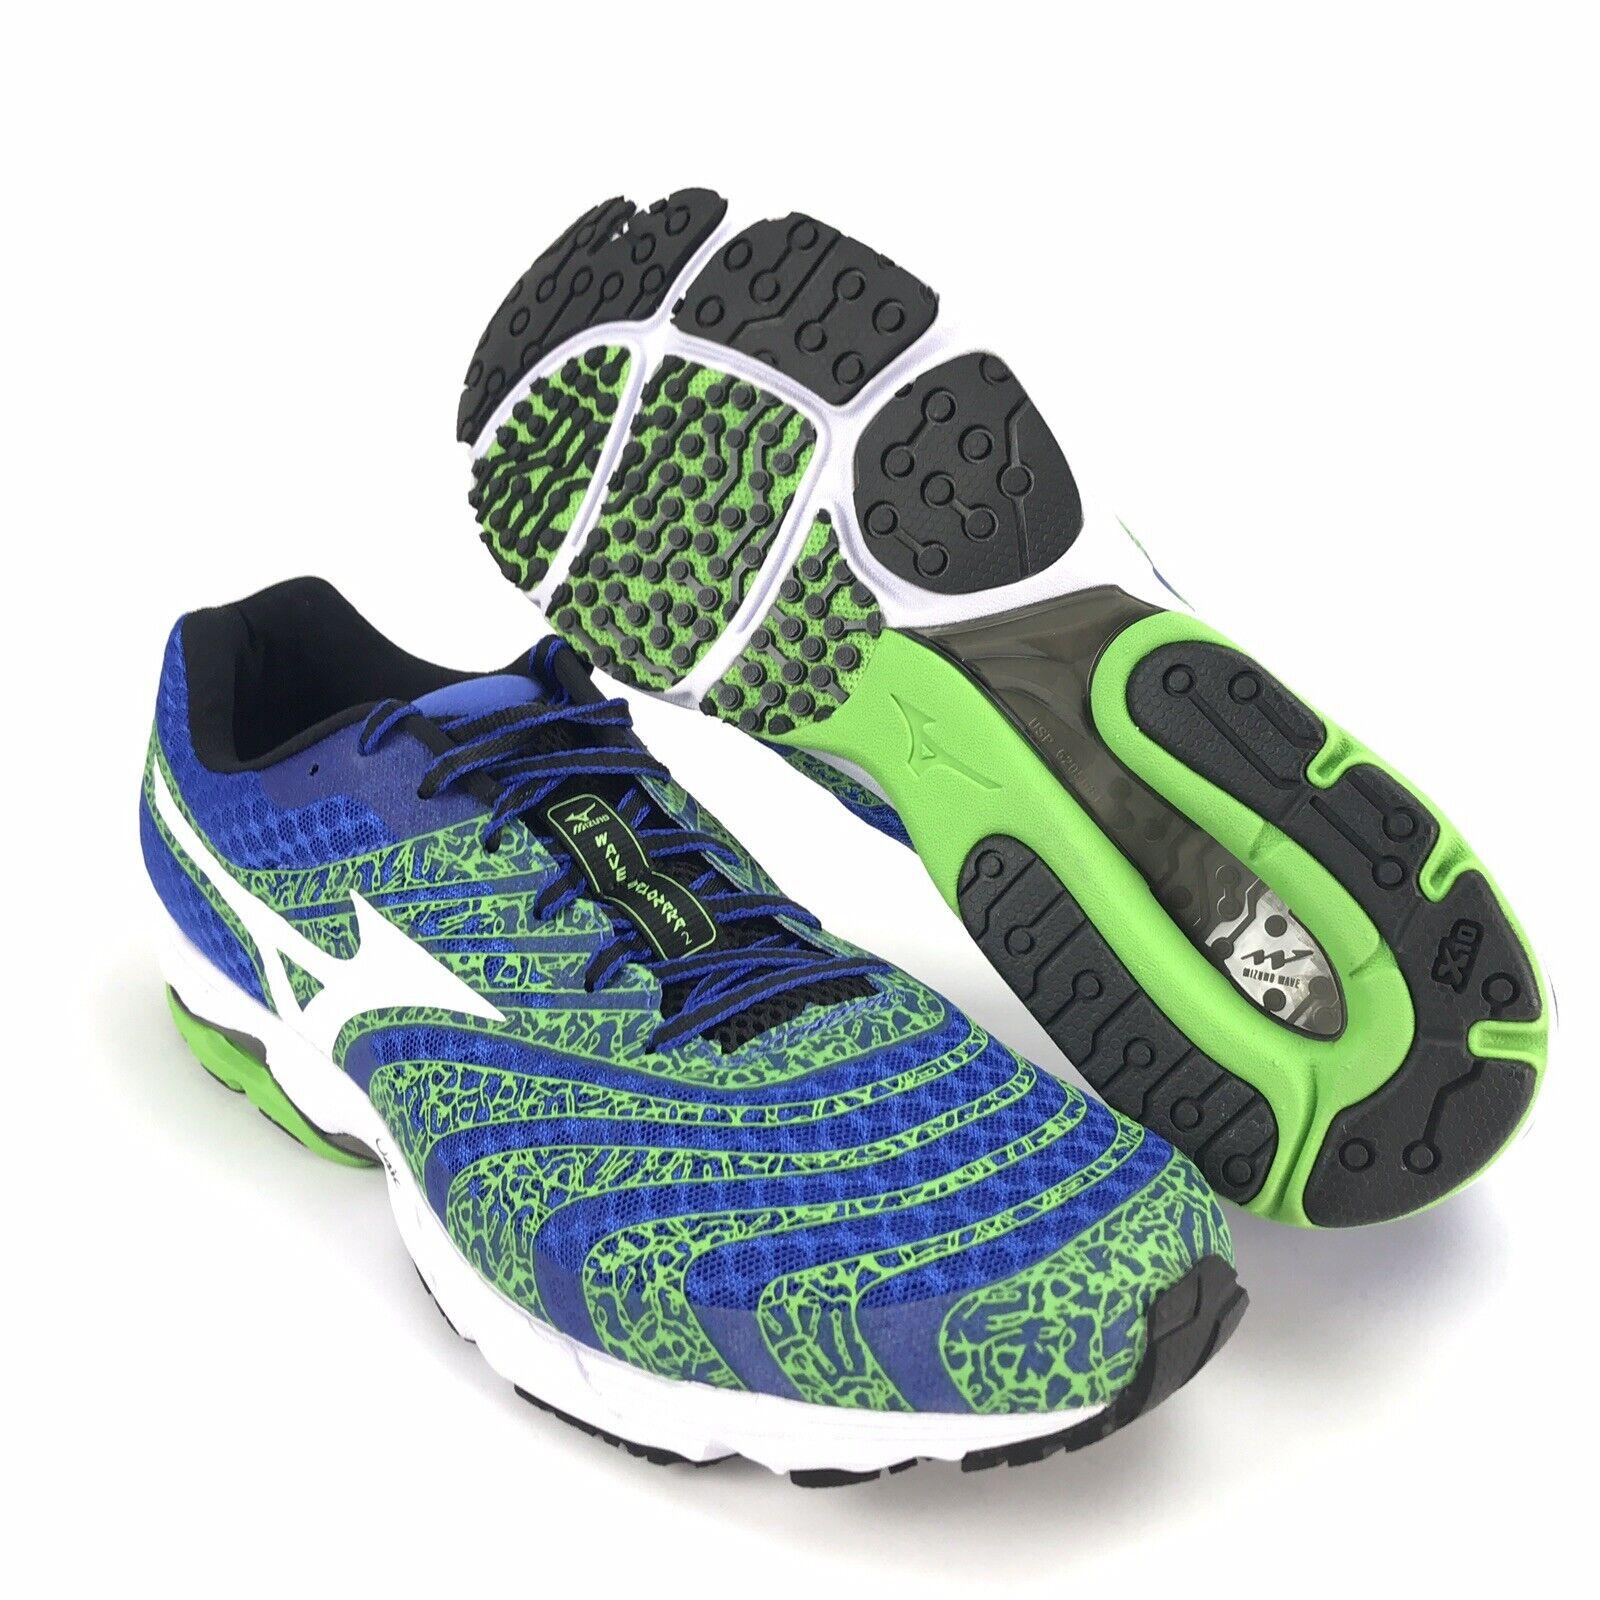 Mizuno Mens Wave Sayonara 2 bluee White Green Running shoes Size 12.5